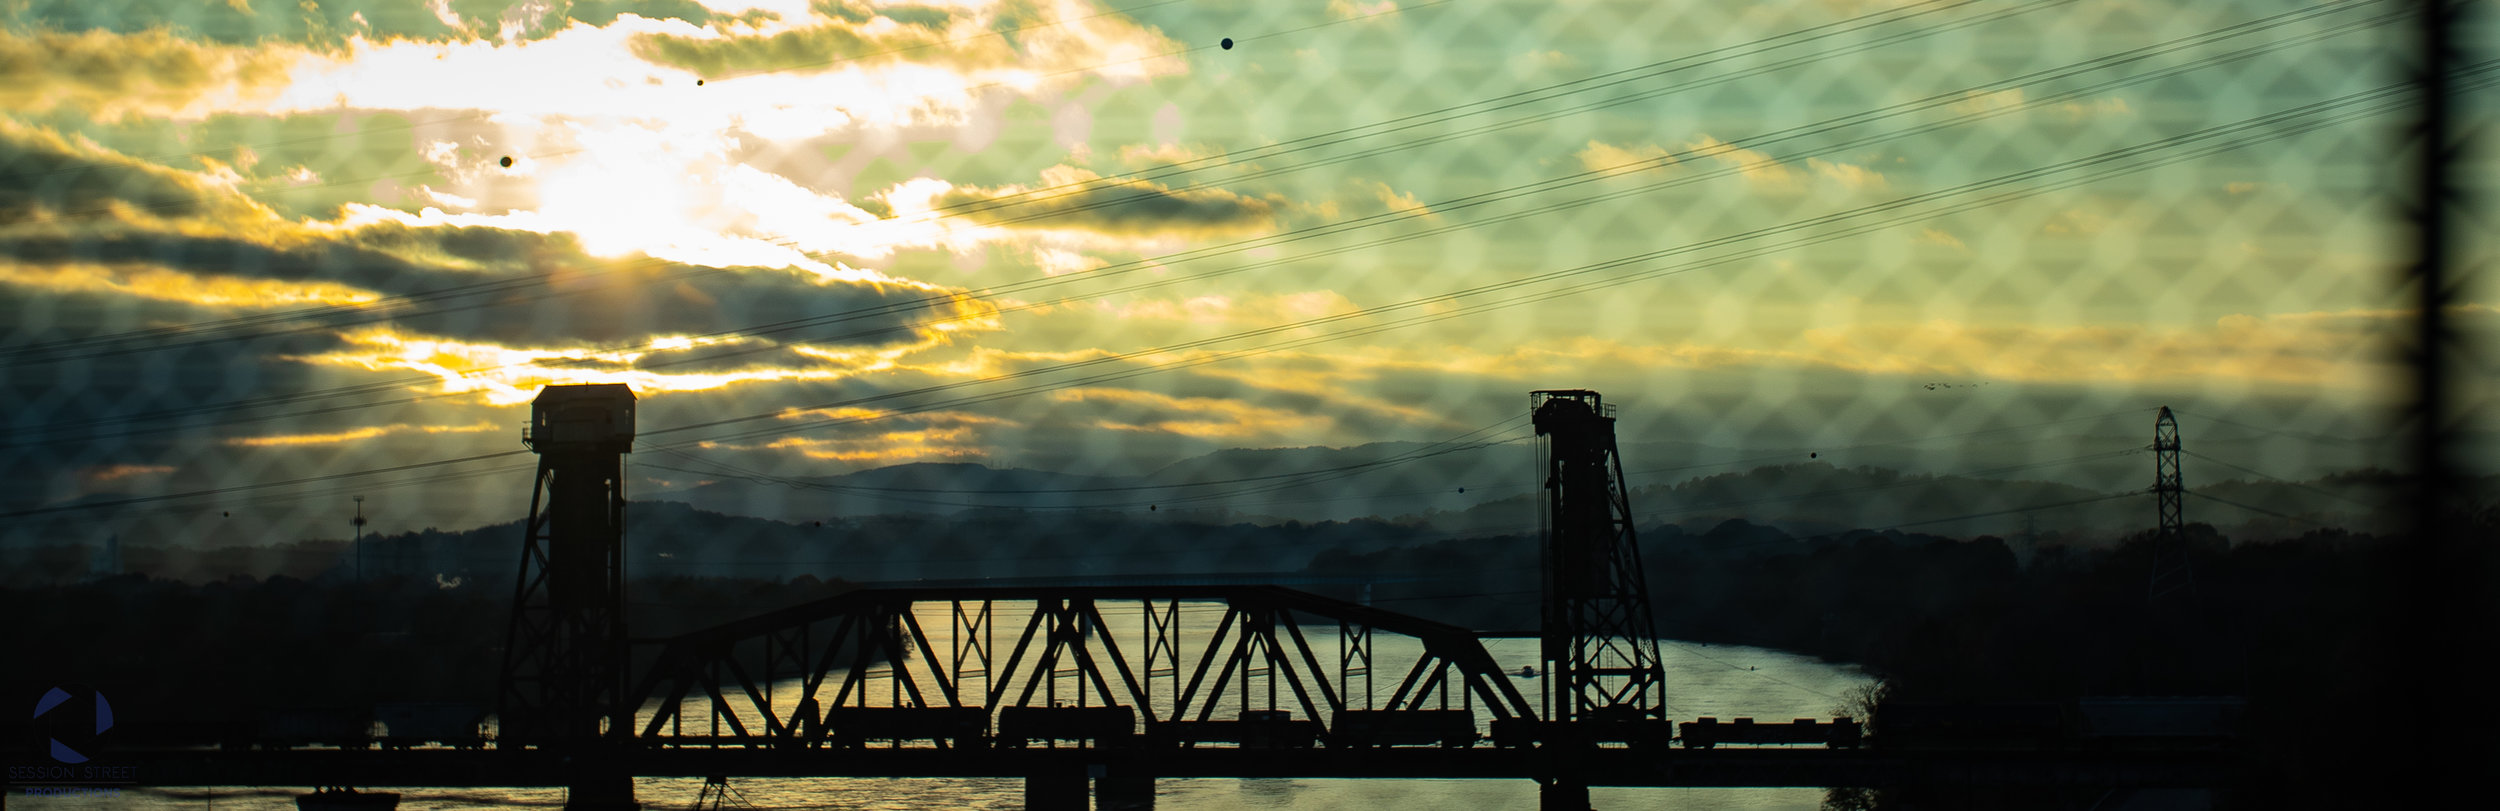 Chattanooga_Bridge.jpg